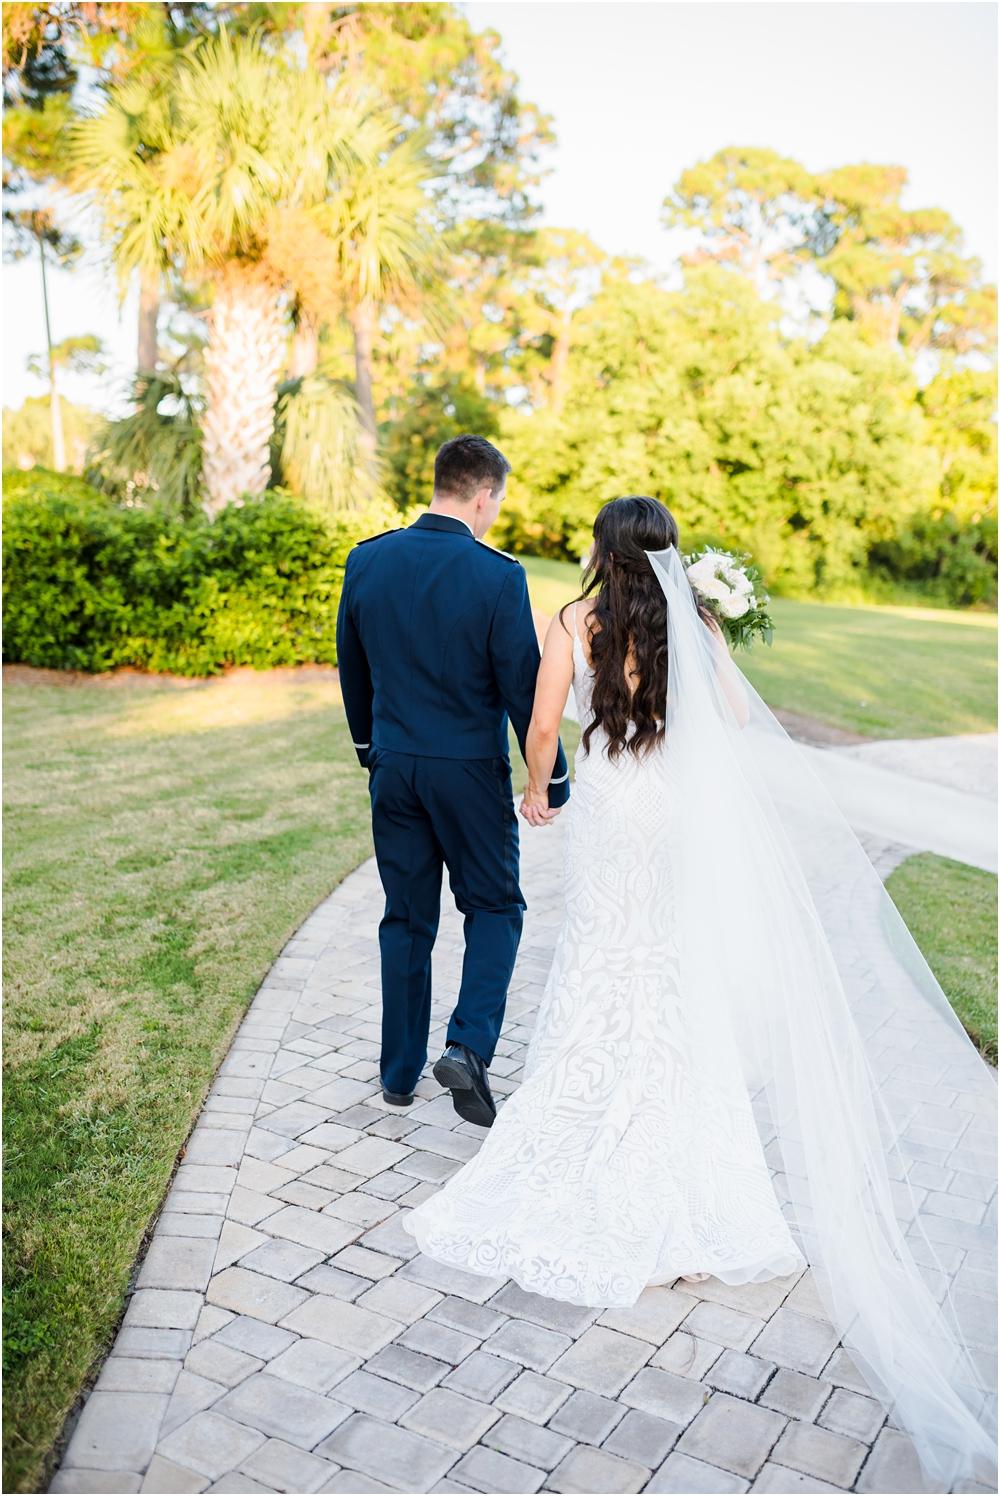 amack-wedding-kiersten-stevenson-photography-30a-panama-city-beach-dothan-tallahassee-(418-of-882).JPG